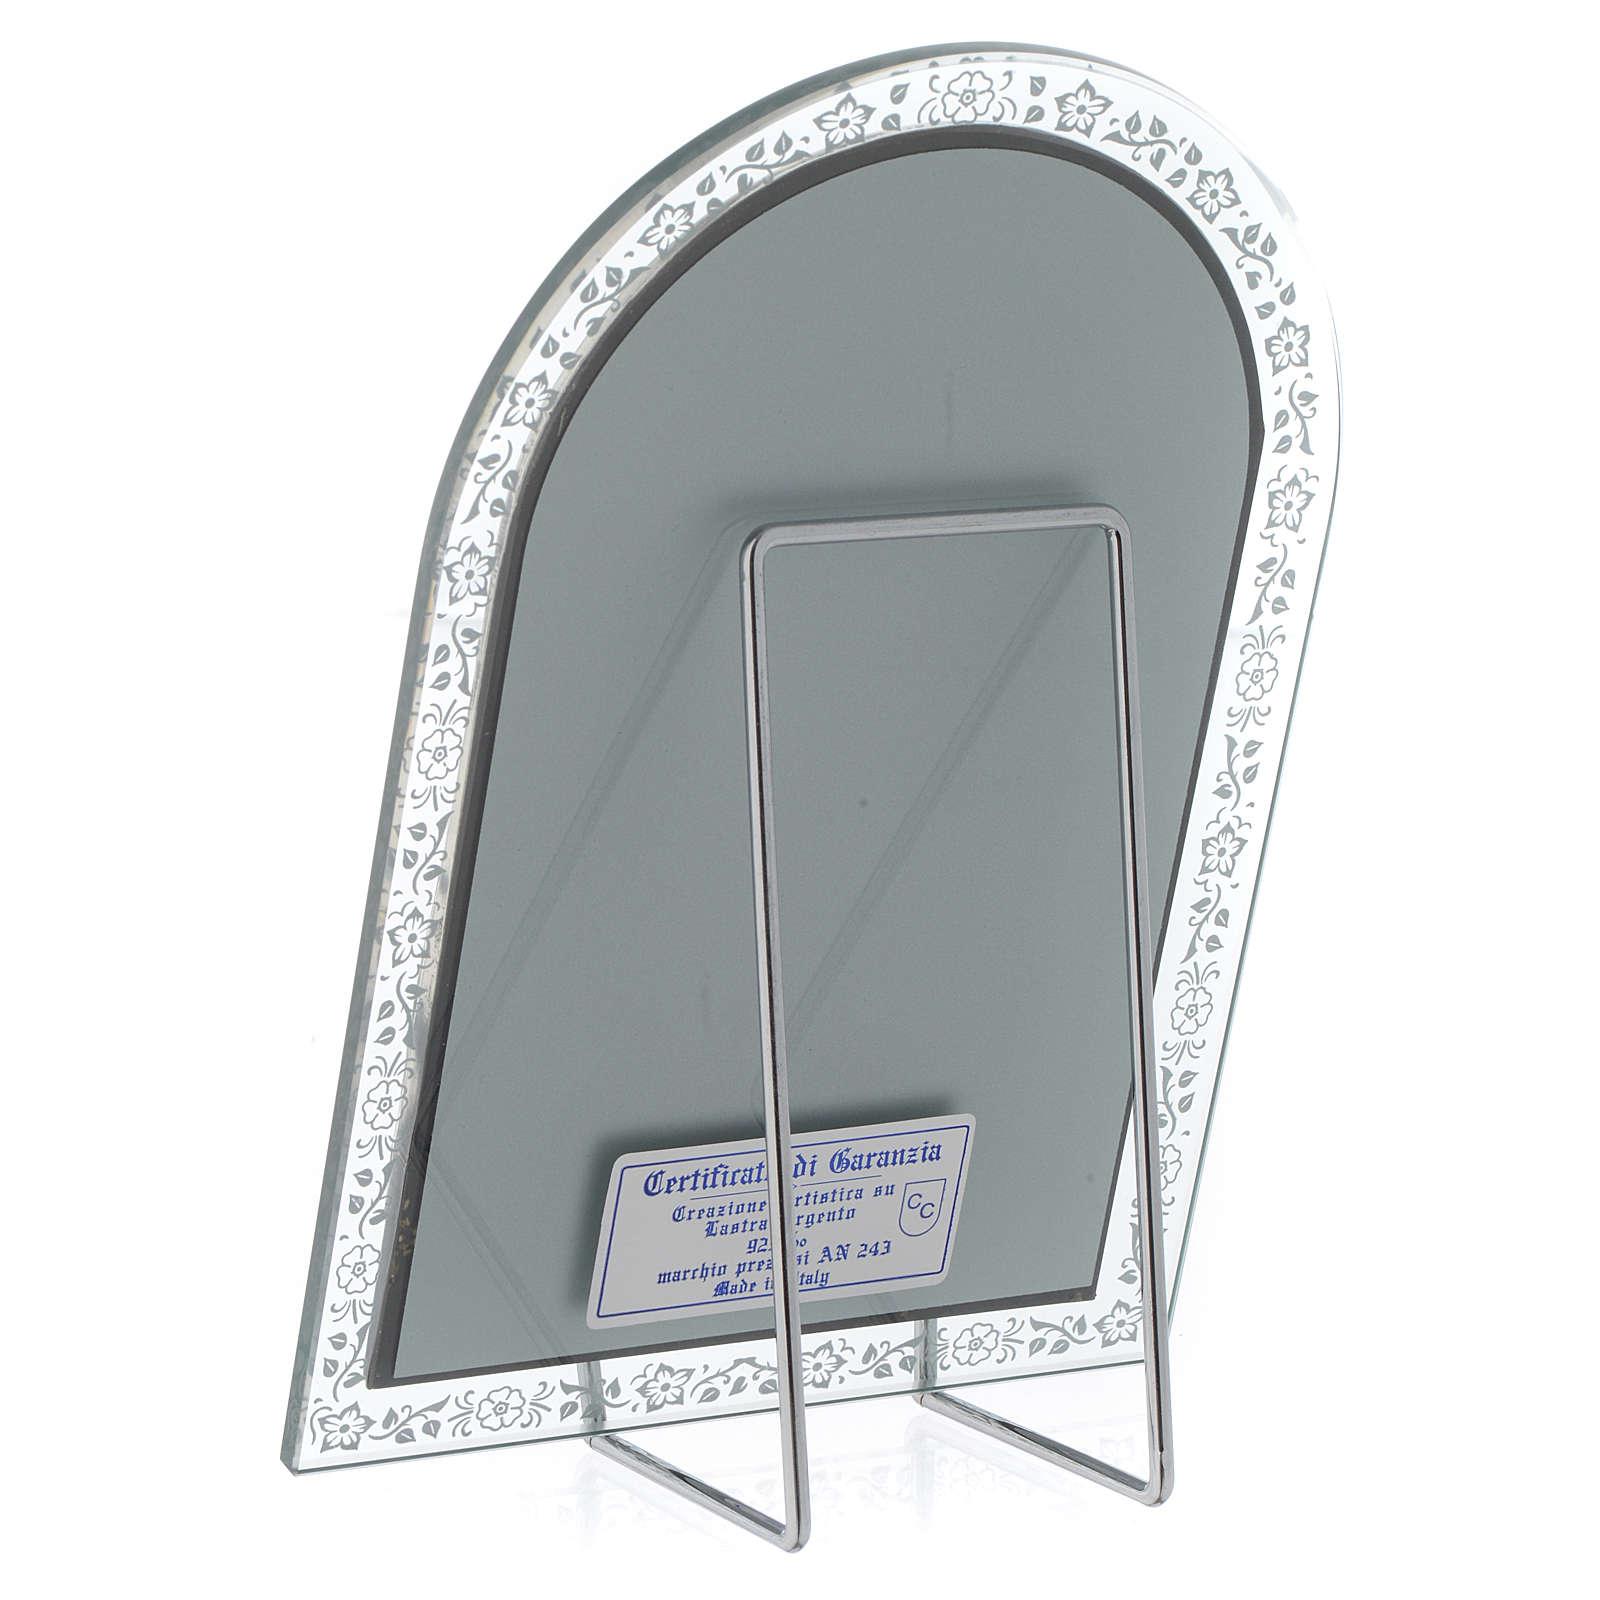 Bassorilievo argento Madonna Ferruzzi cornice vetro 4